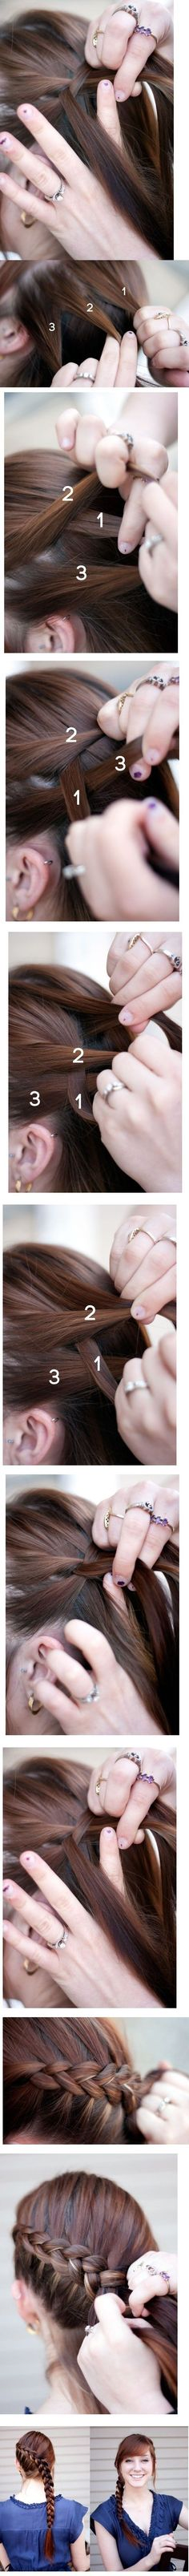 20 40 Pretty Braided Crown Hairstyle Tutorials and Ideas